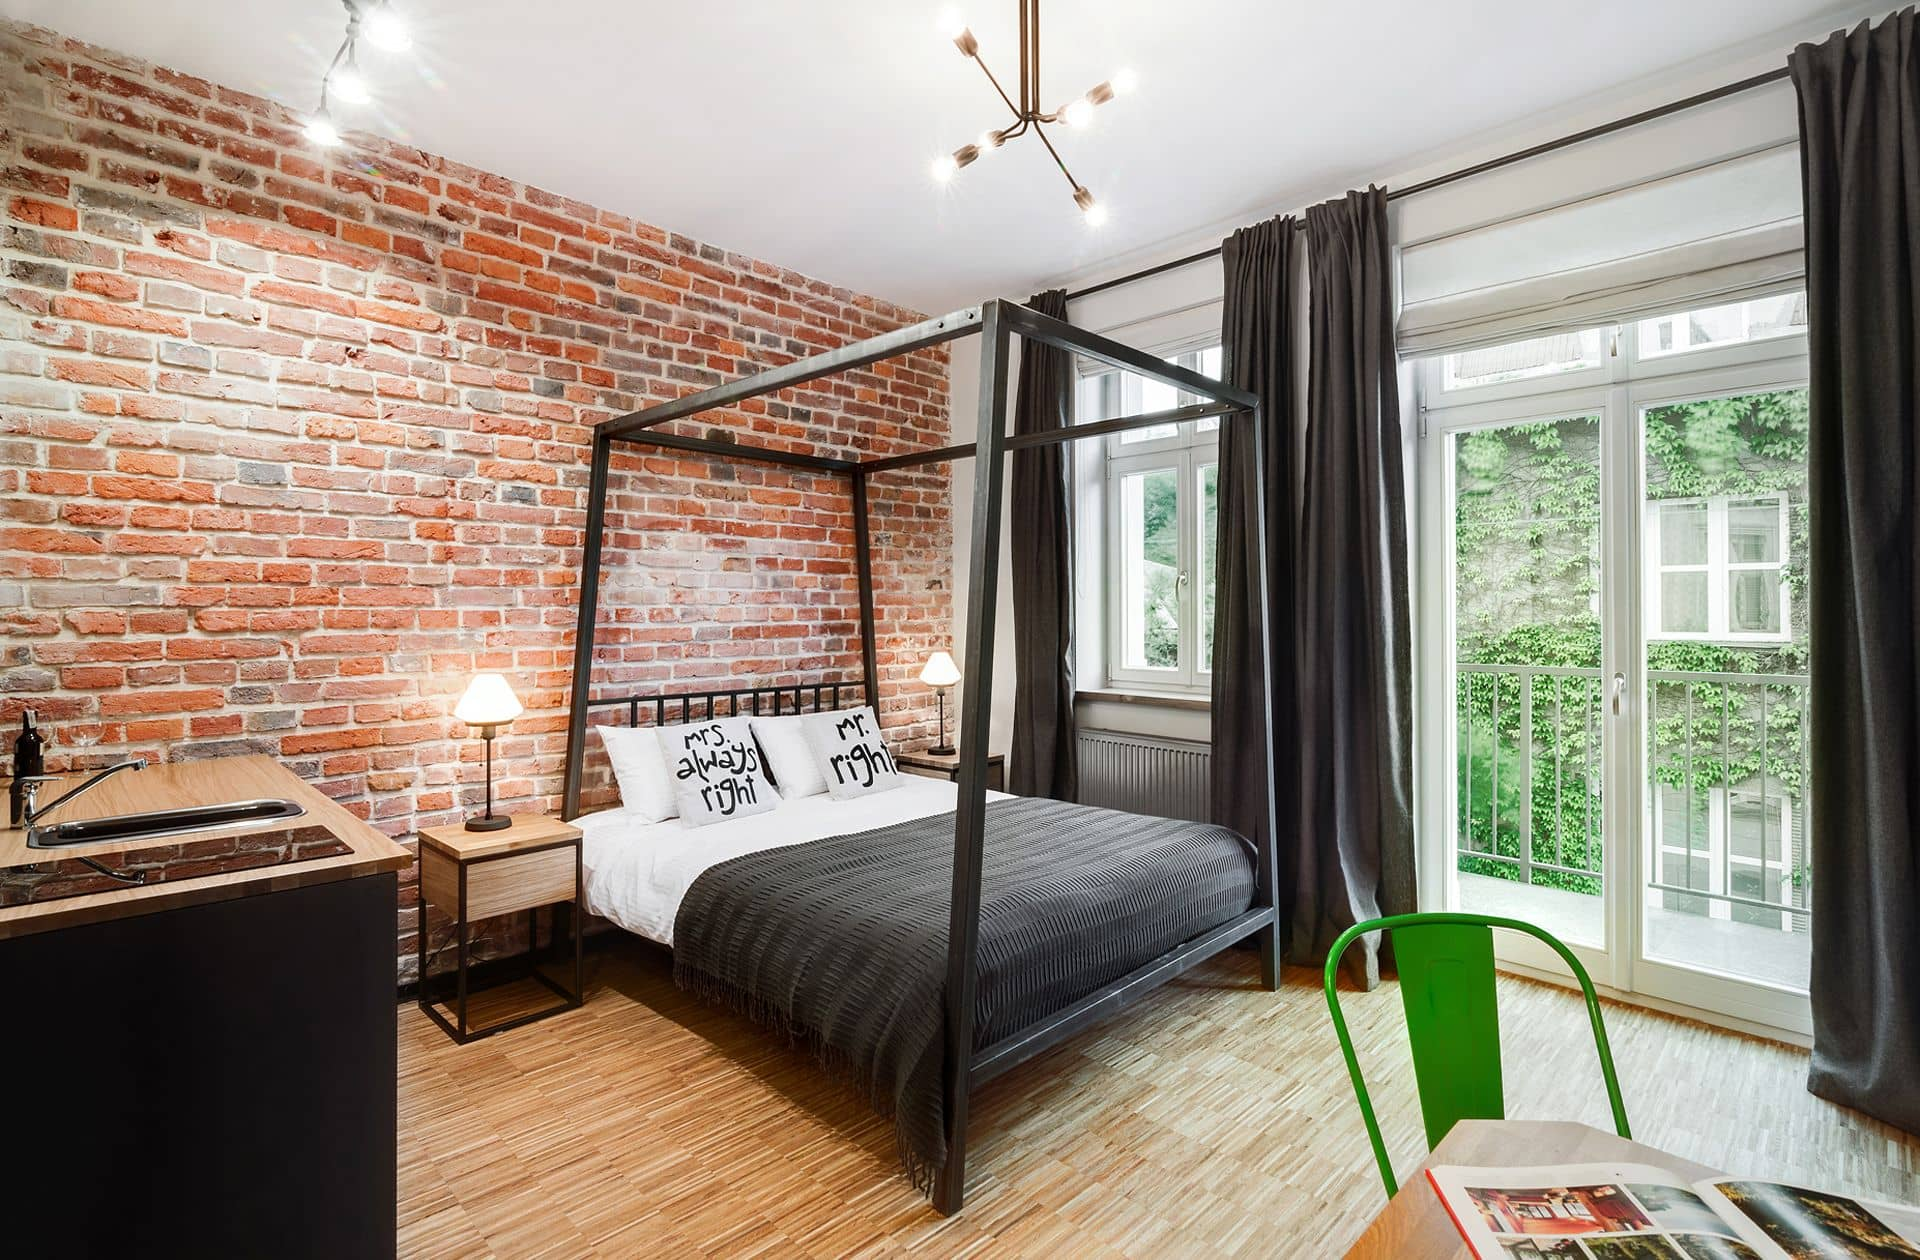 wellwellaparthotel.pl - apartments in Krakow